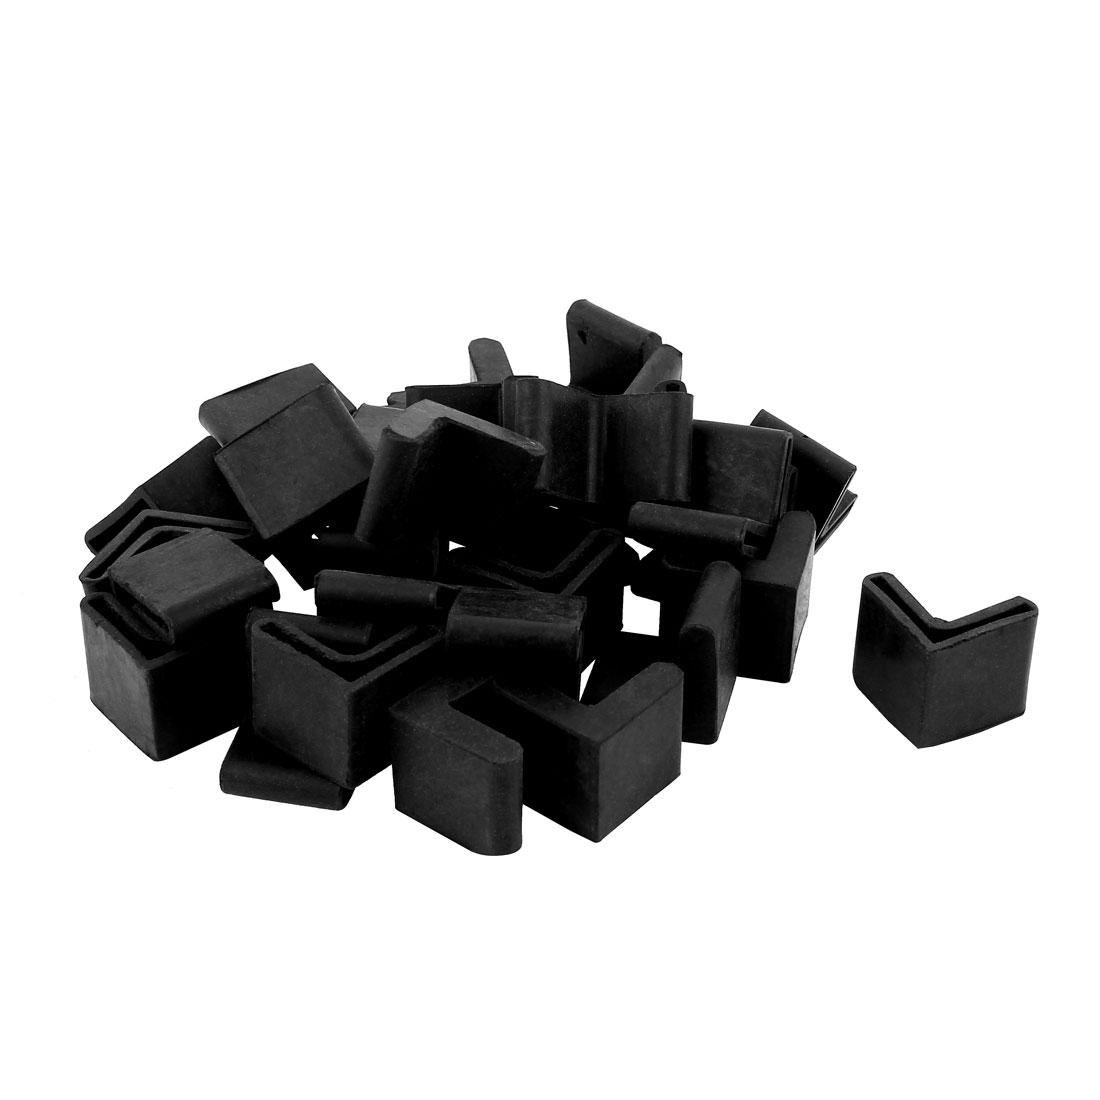 30 Pcs Triangle Shaped Furniture Table Corner Cushion Protector 25mmx25mm Black